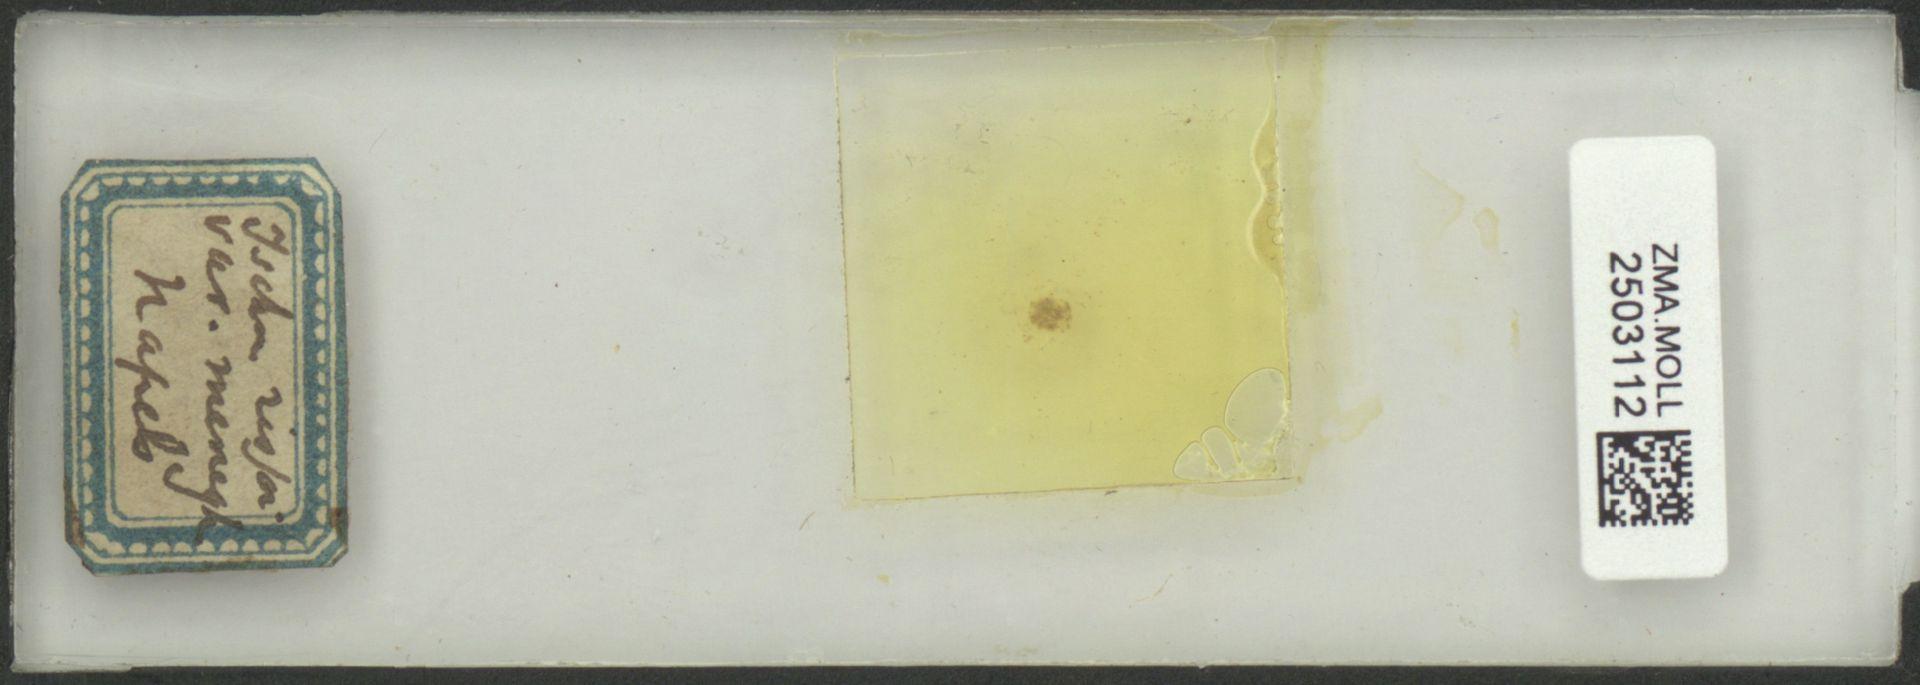 ZMA.MOLL.2503112   Ischnochiton rissoi (Payraudeau, 1826)